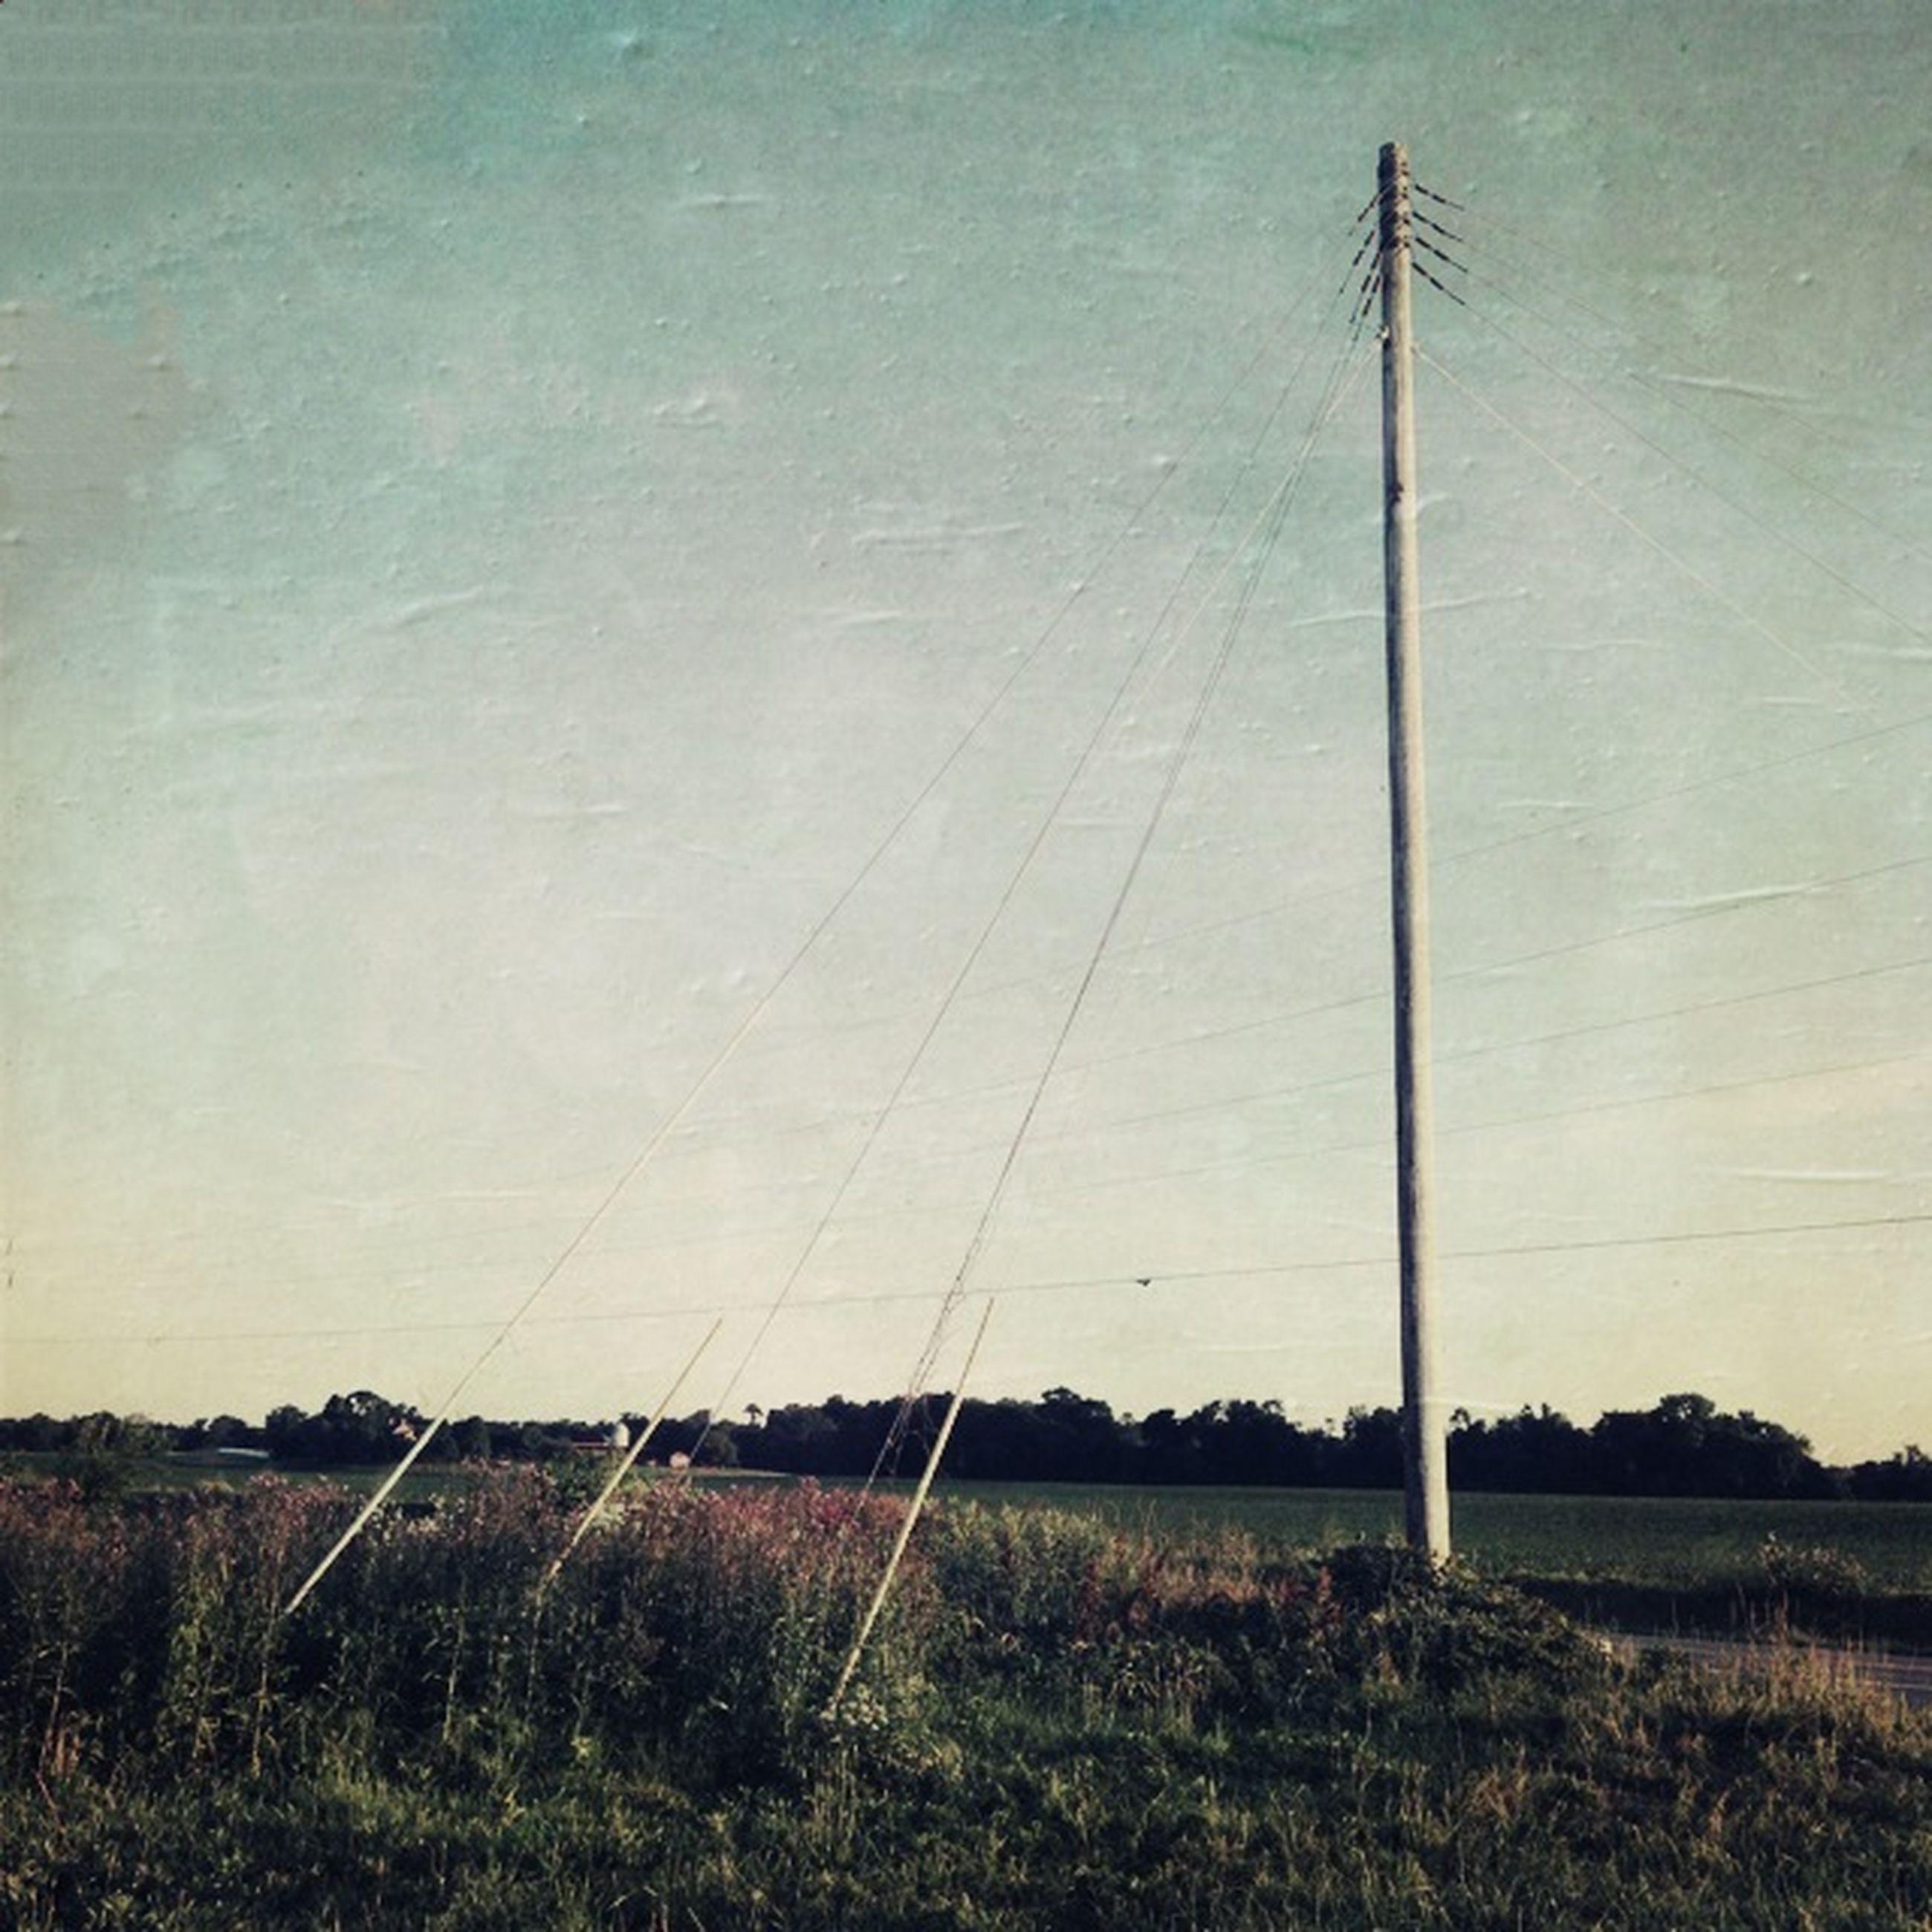 field, fuel and power generation, grass, electricity pylon, landscape, technology, wind turbine, alternative energy, electricity, power line, sky, environmental conservation, renewable energy, tranquility, wind power, power supply, windmill, nature, tranquil scene, rural scene